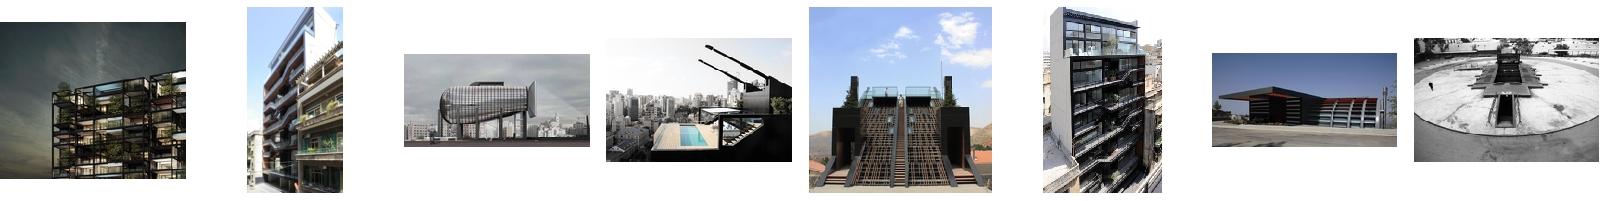 bernard tschumi projects